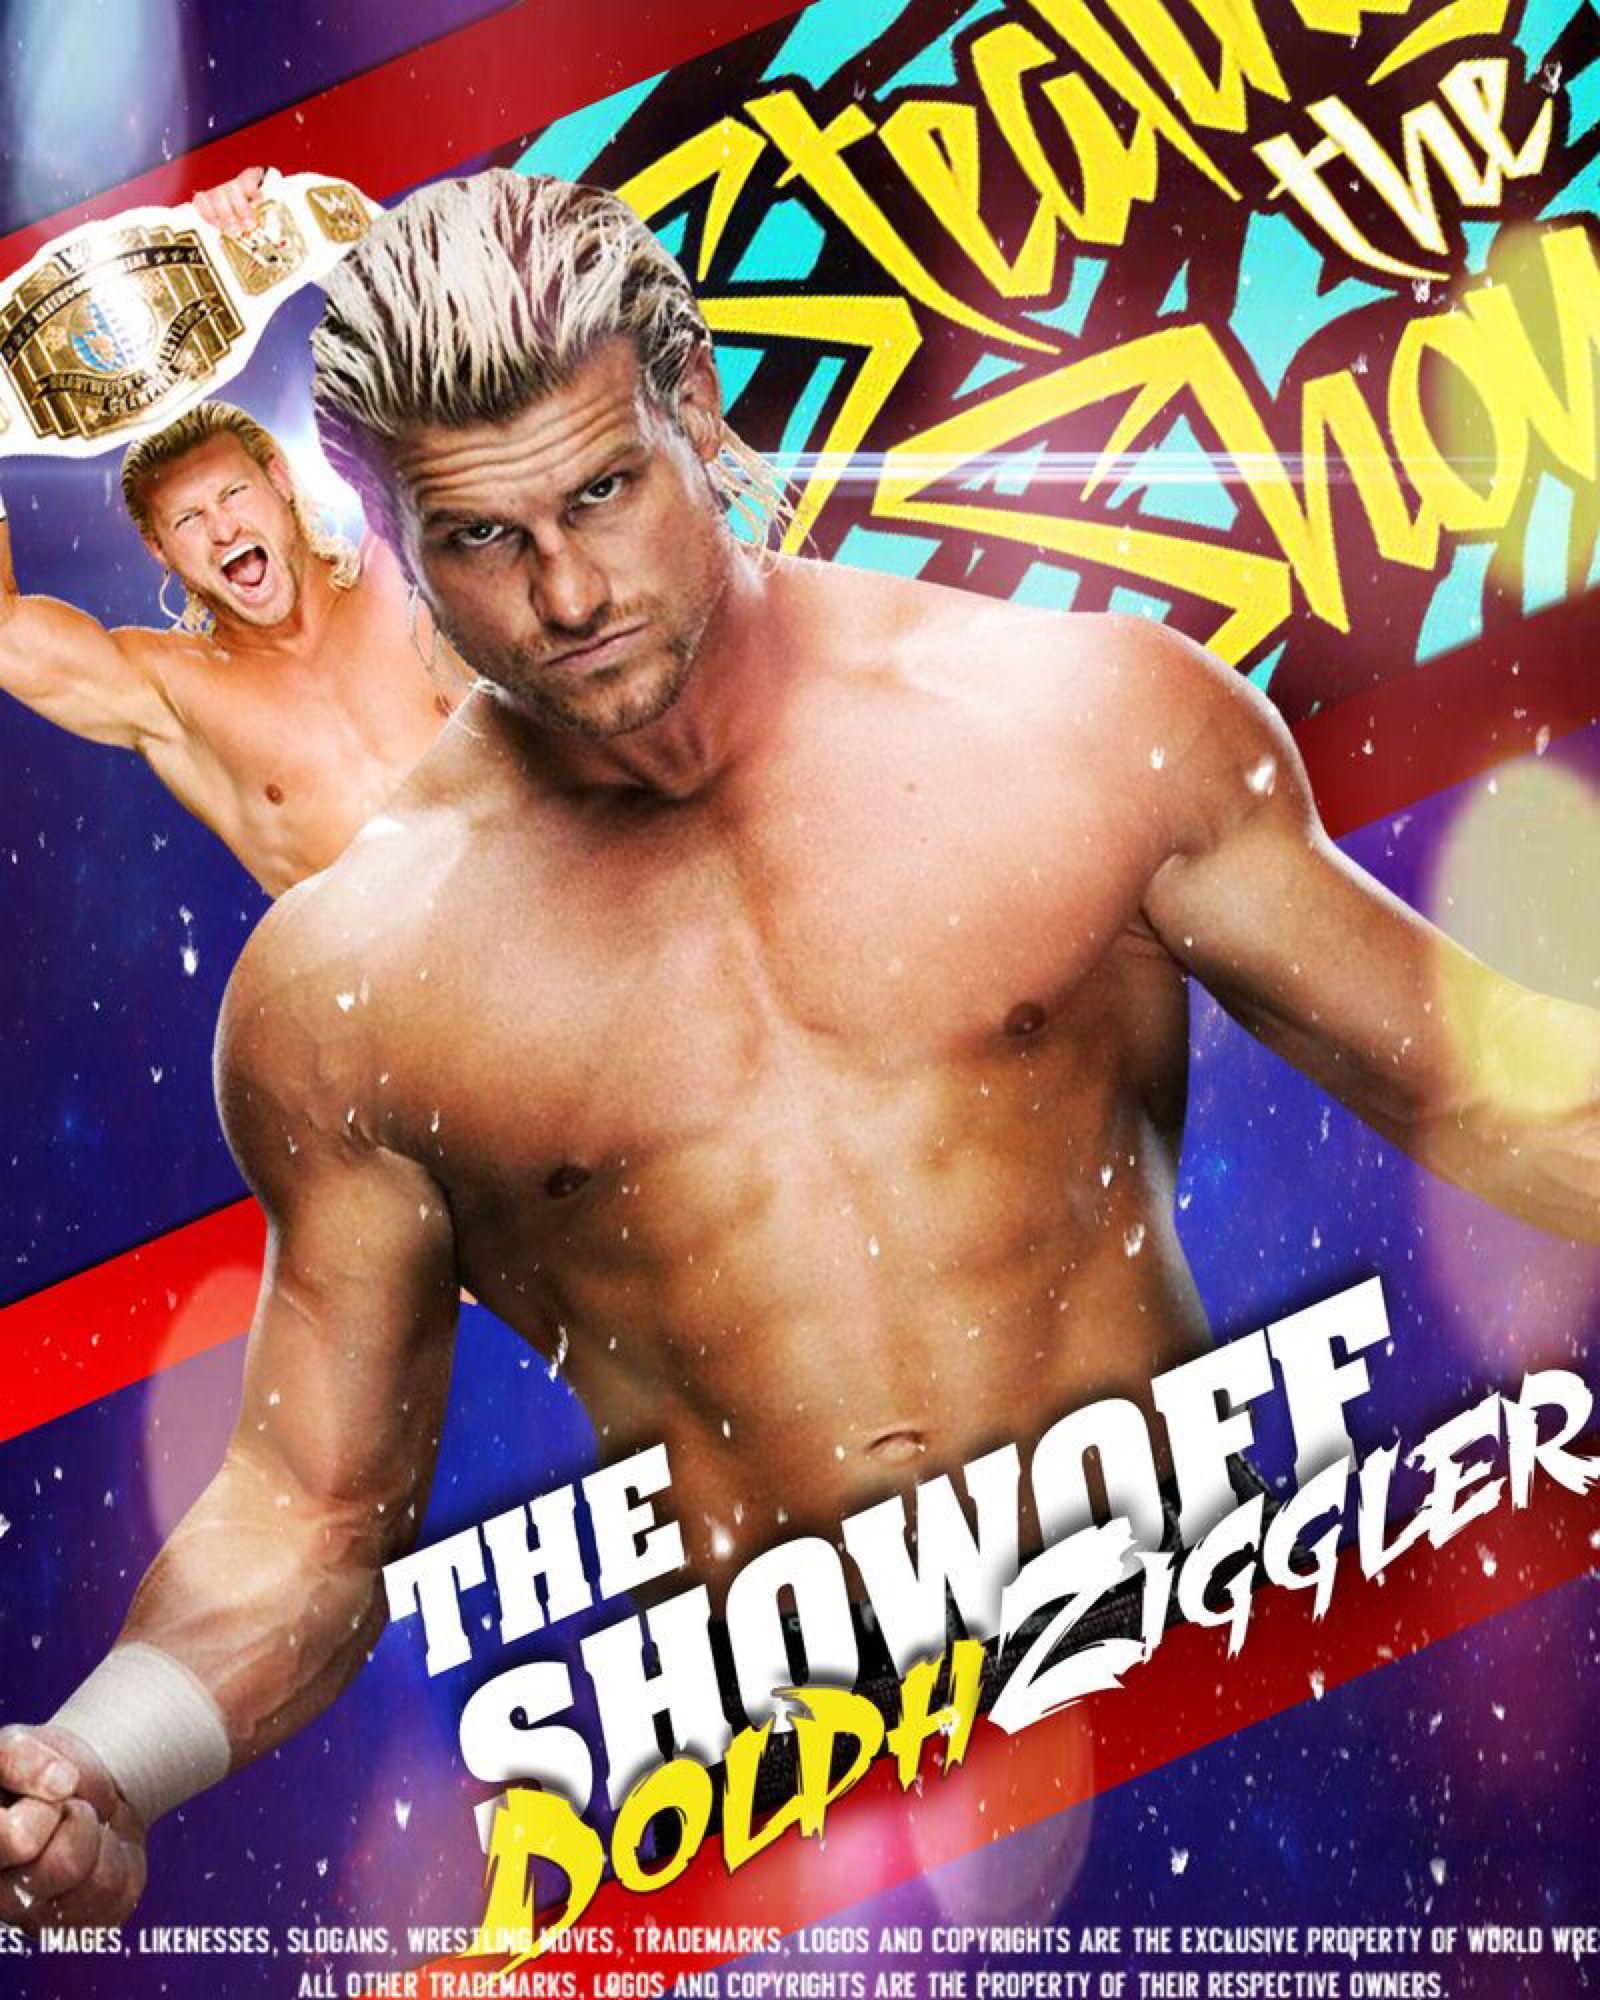 Dolph Ziggler Wallpaper By Siddcrash On Deviantart Dolph Ziggler Best Wwe Wrestlers Adam Cole Wwe